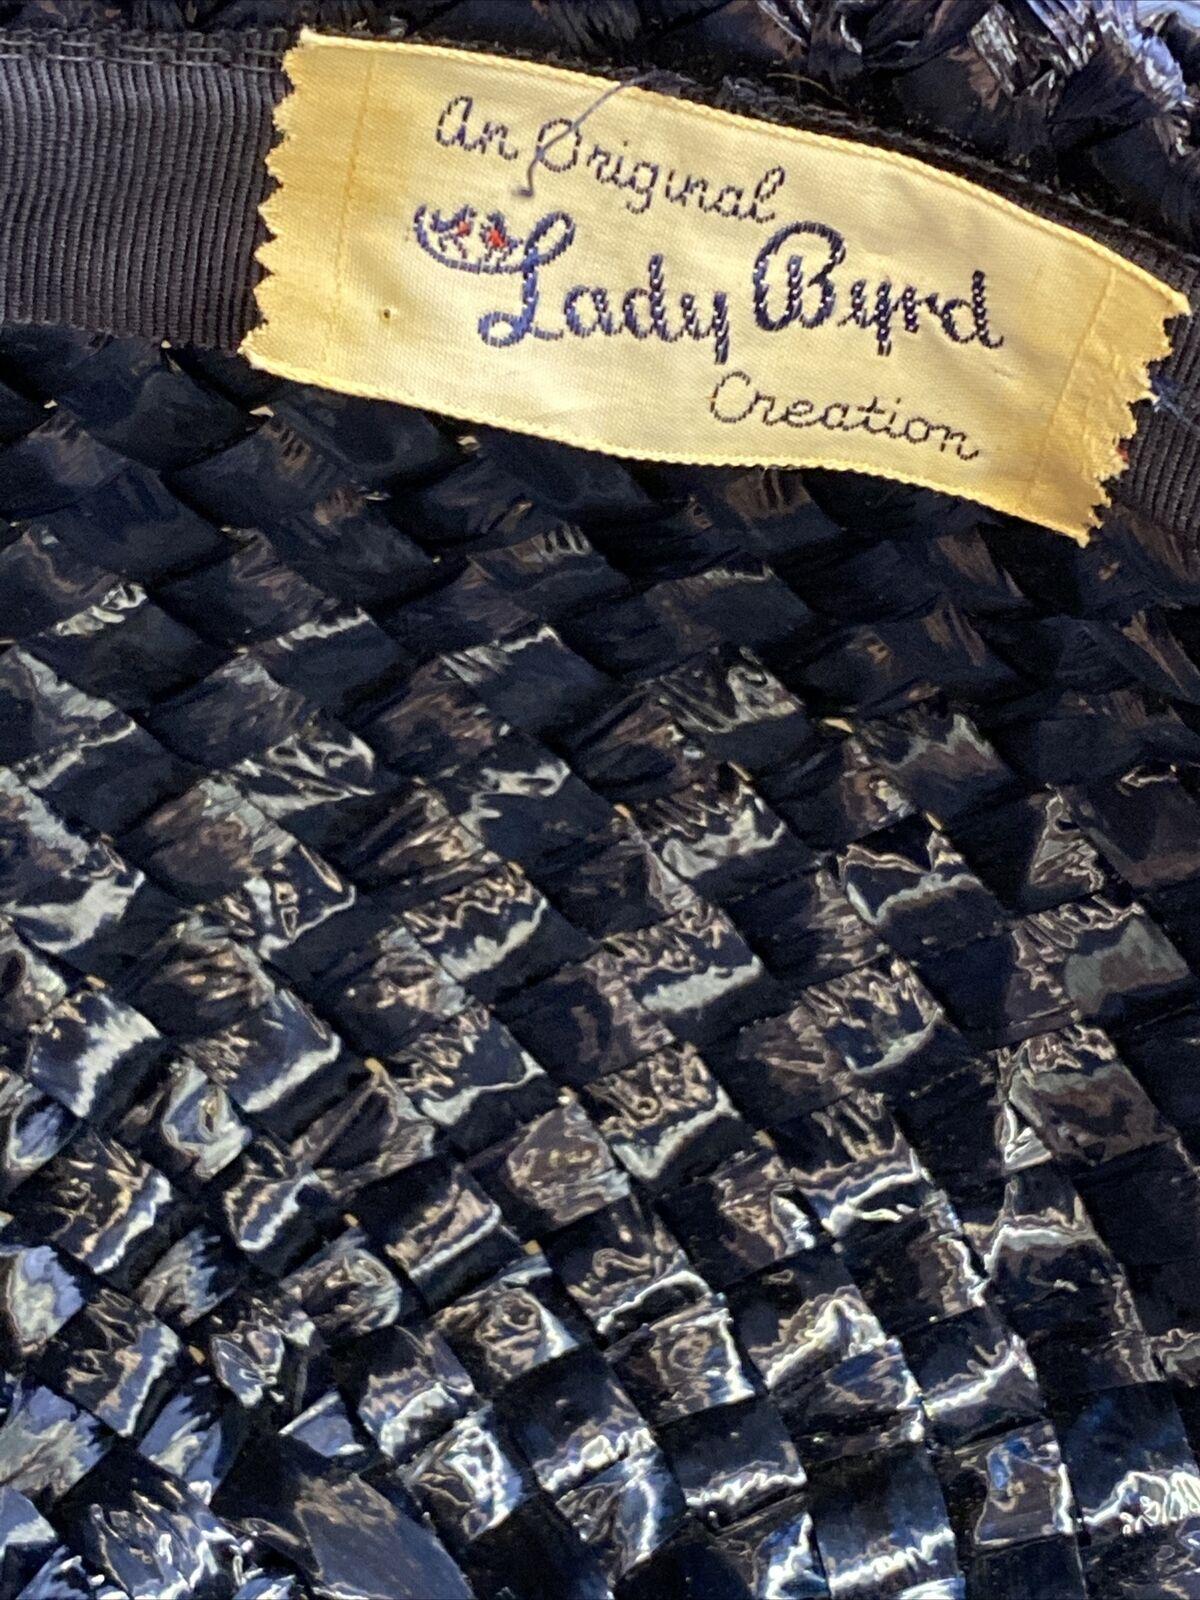 An Original Lady Byrd Creation Blue Hat c.1960's - image 2